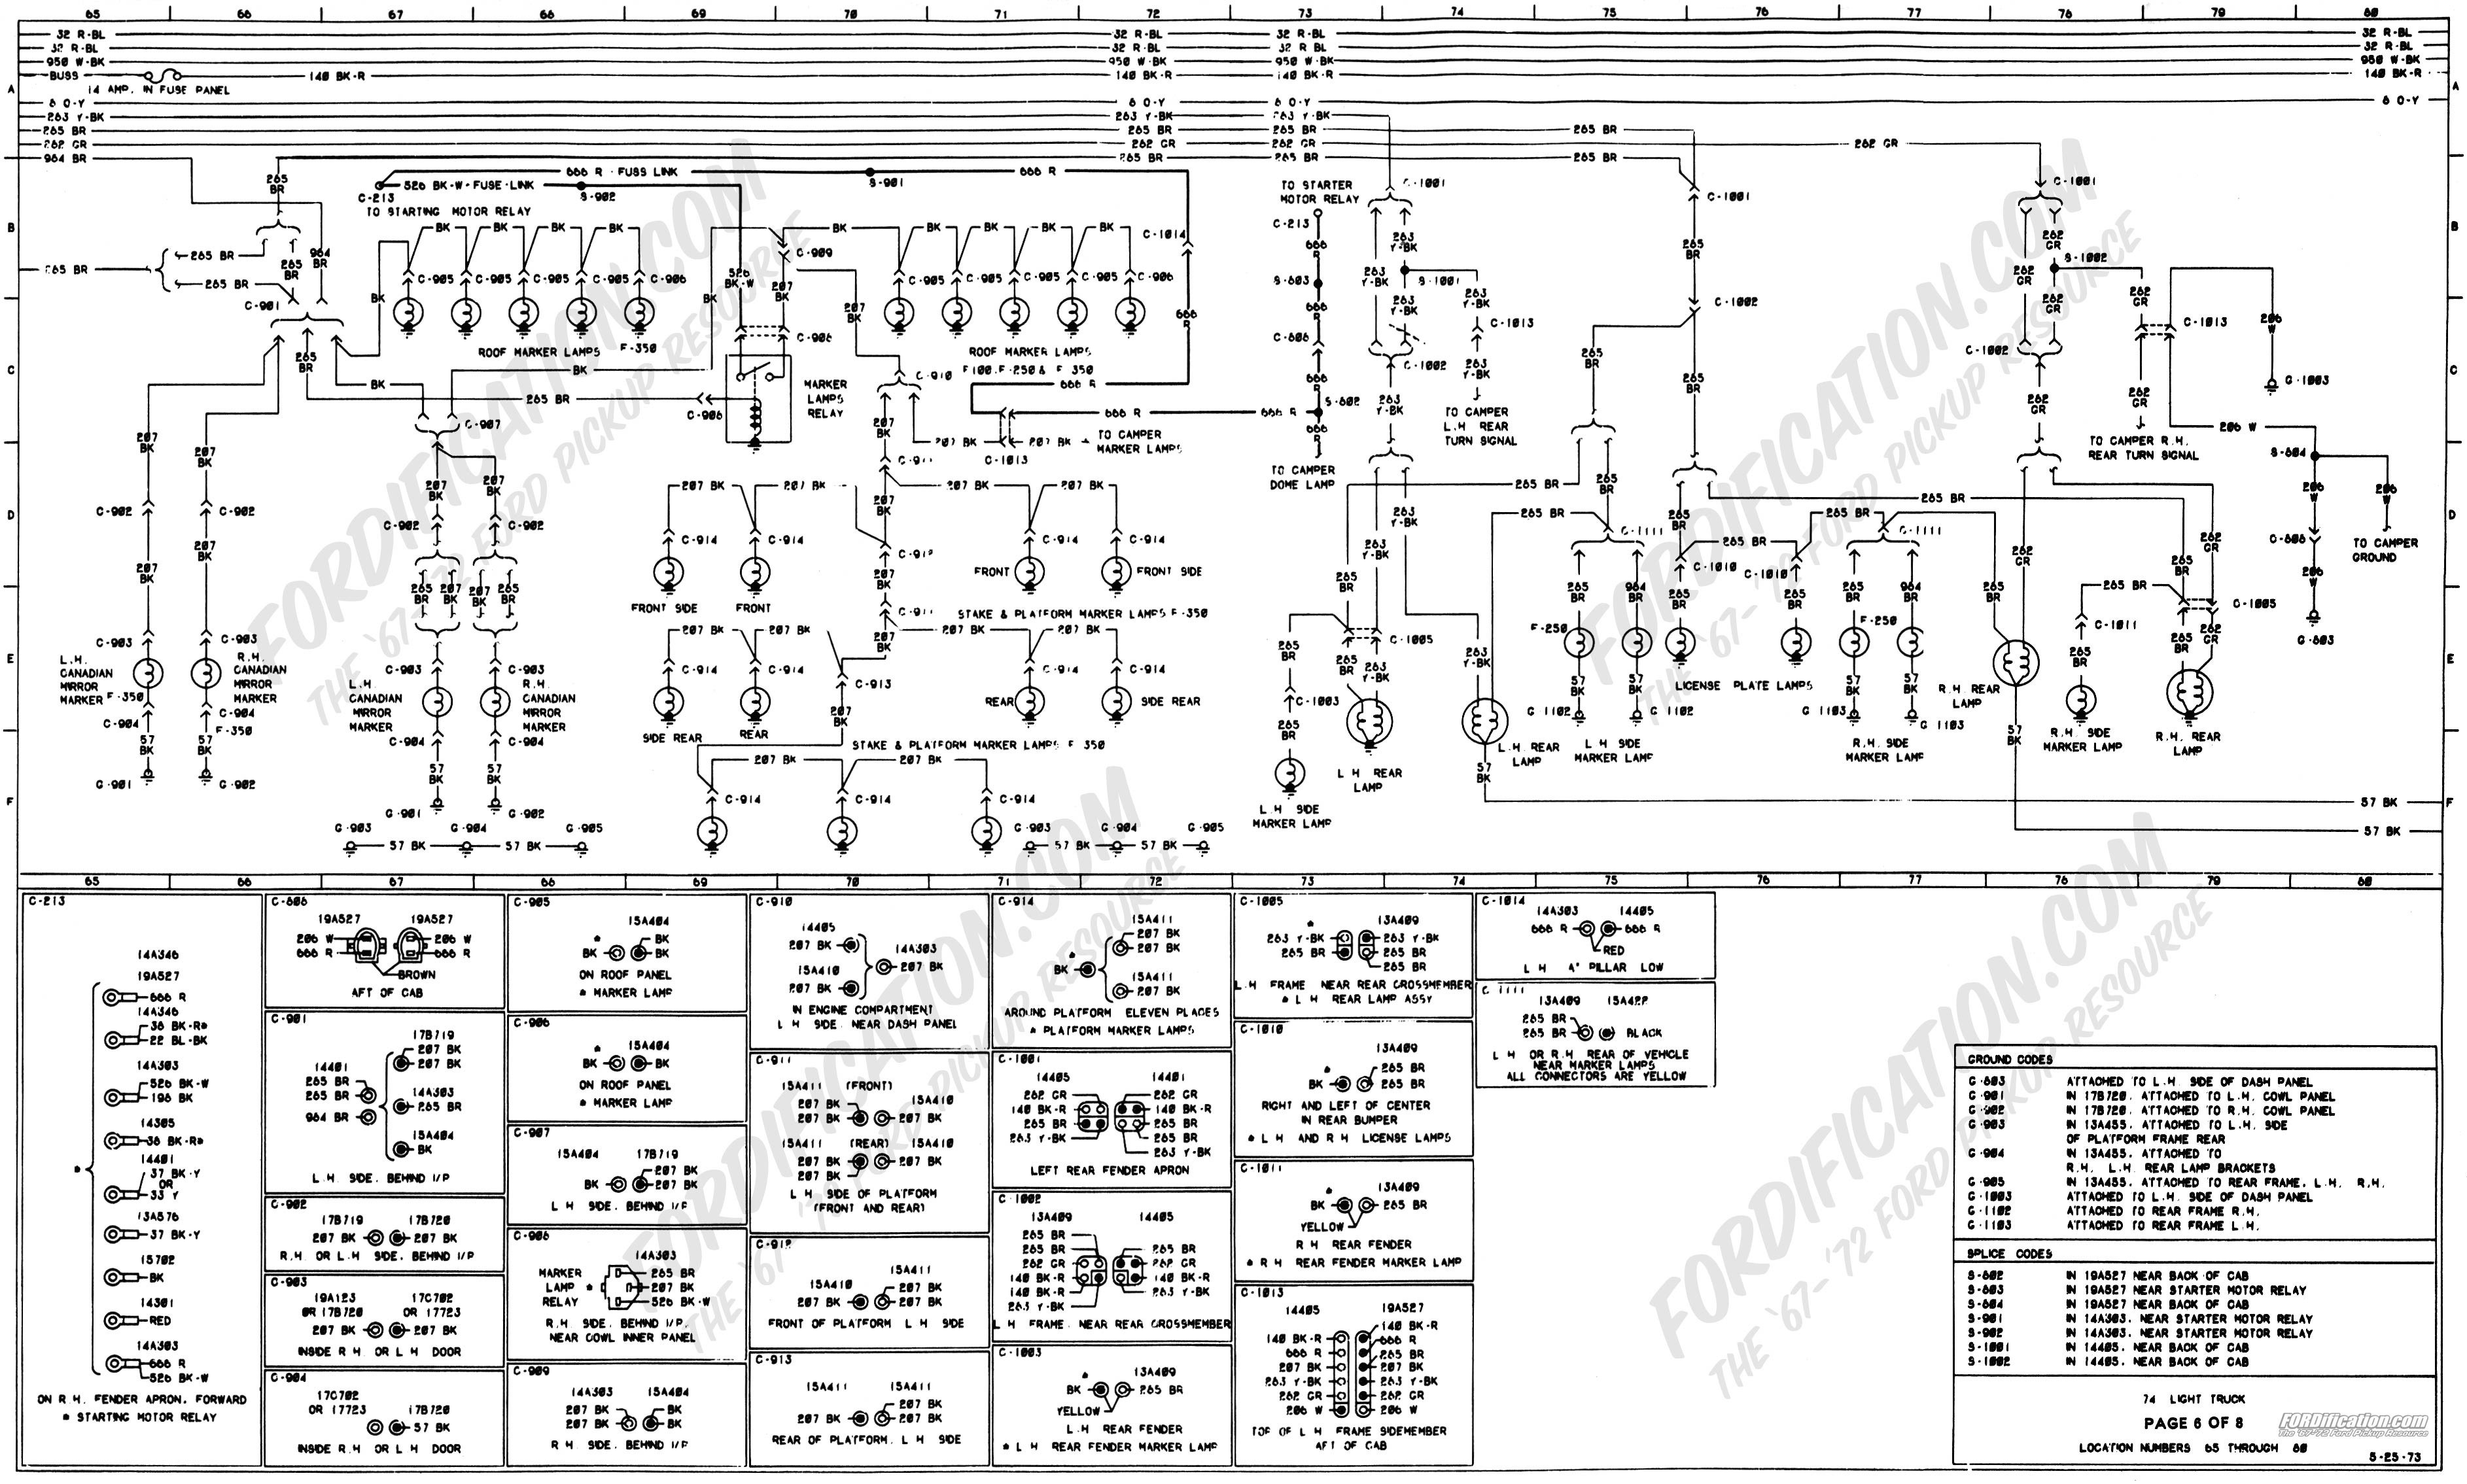 Diagram Of A V8 Engine ford F150 Wiring Diagrams Best Volvo S40 2 0d Engine Diagram Free Of Diagram Of A V8 Engine